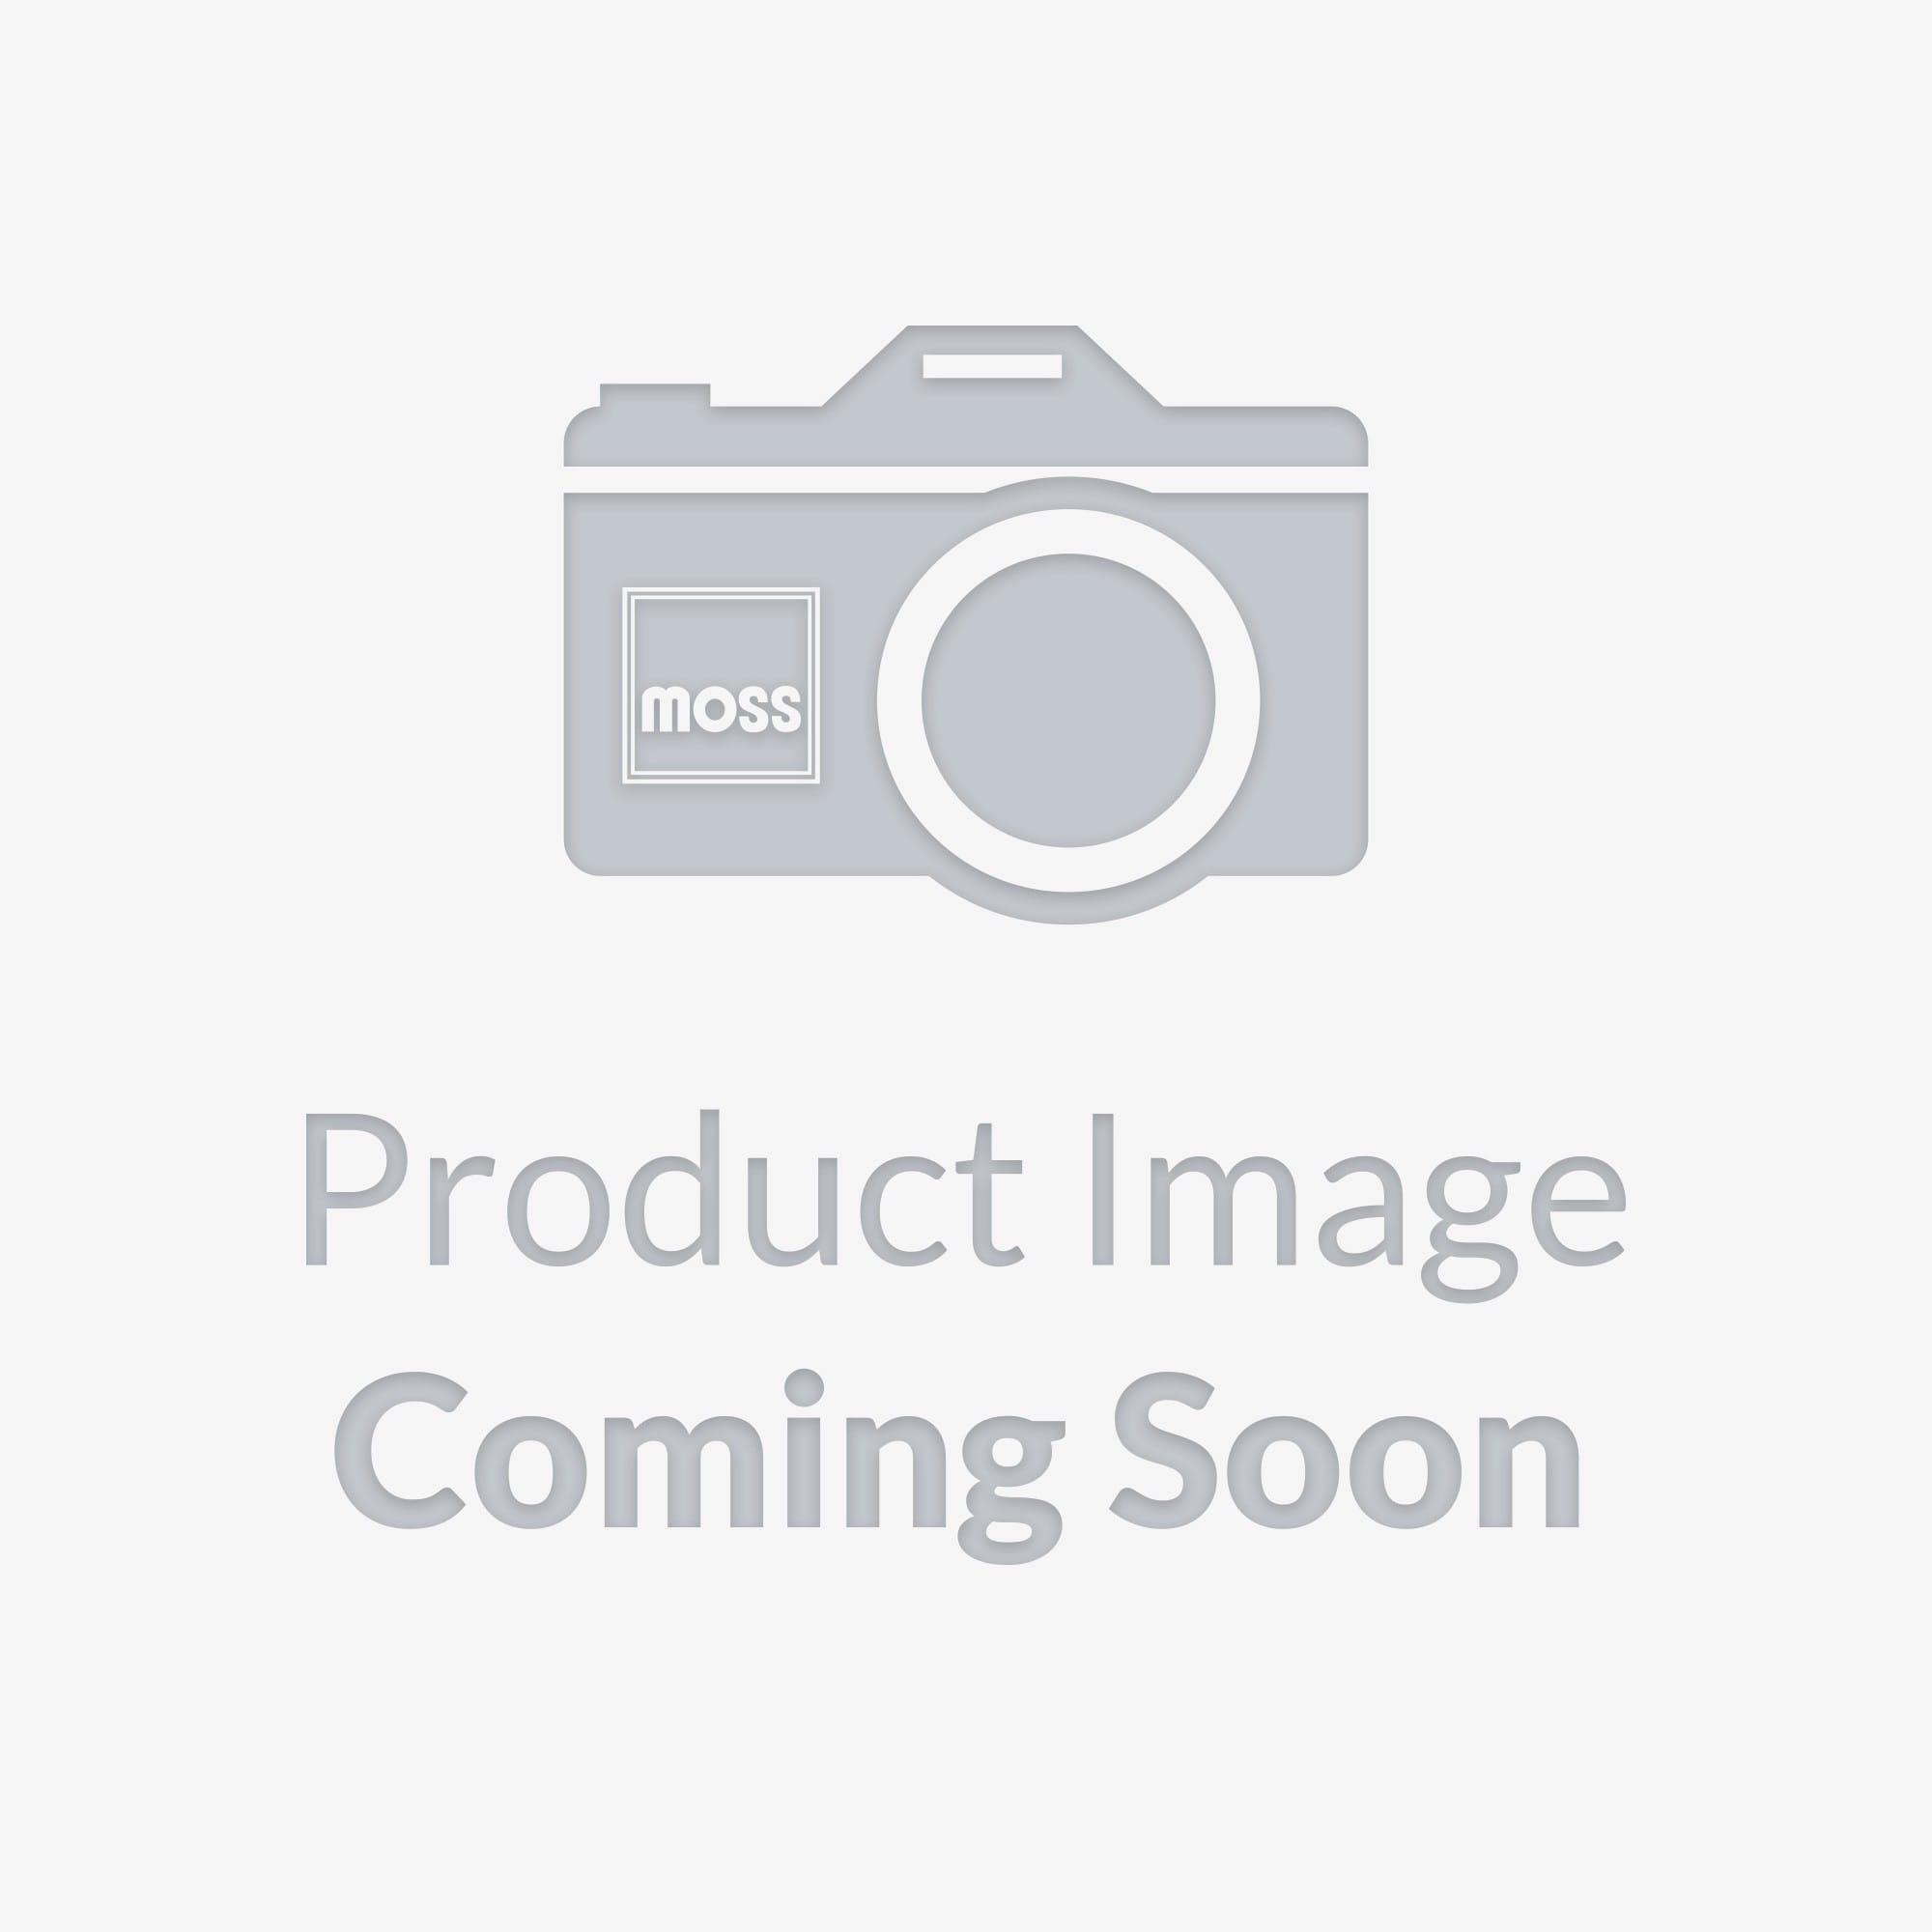 [DIAGRAM_4PO]  162-030 Wiring Harness Tape, Blue | Moss Motors | Triumph Wiring Harness Repair Tape |  | Moss Motors